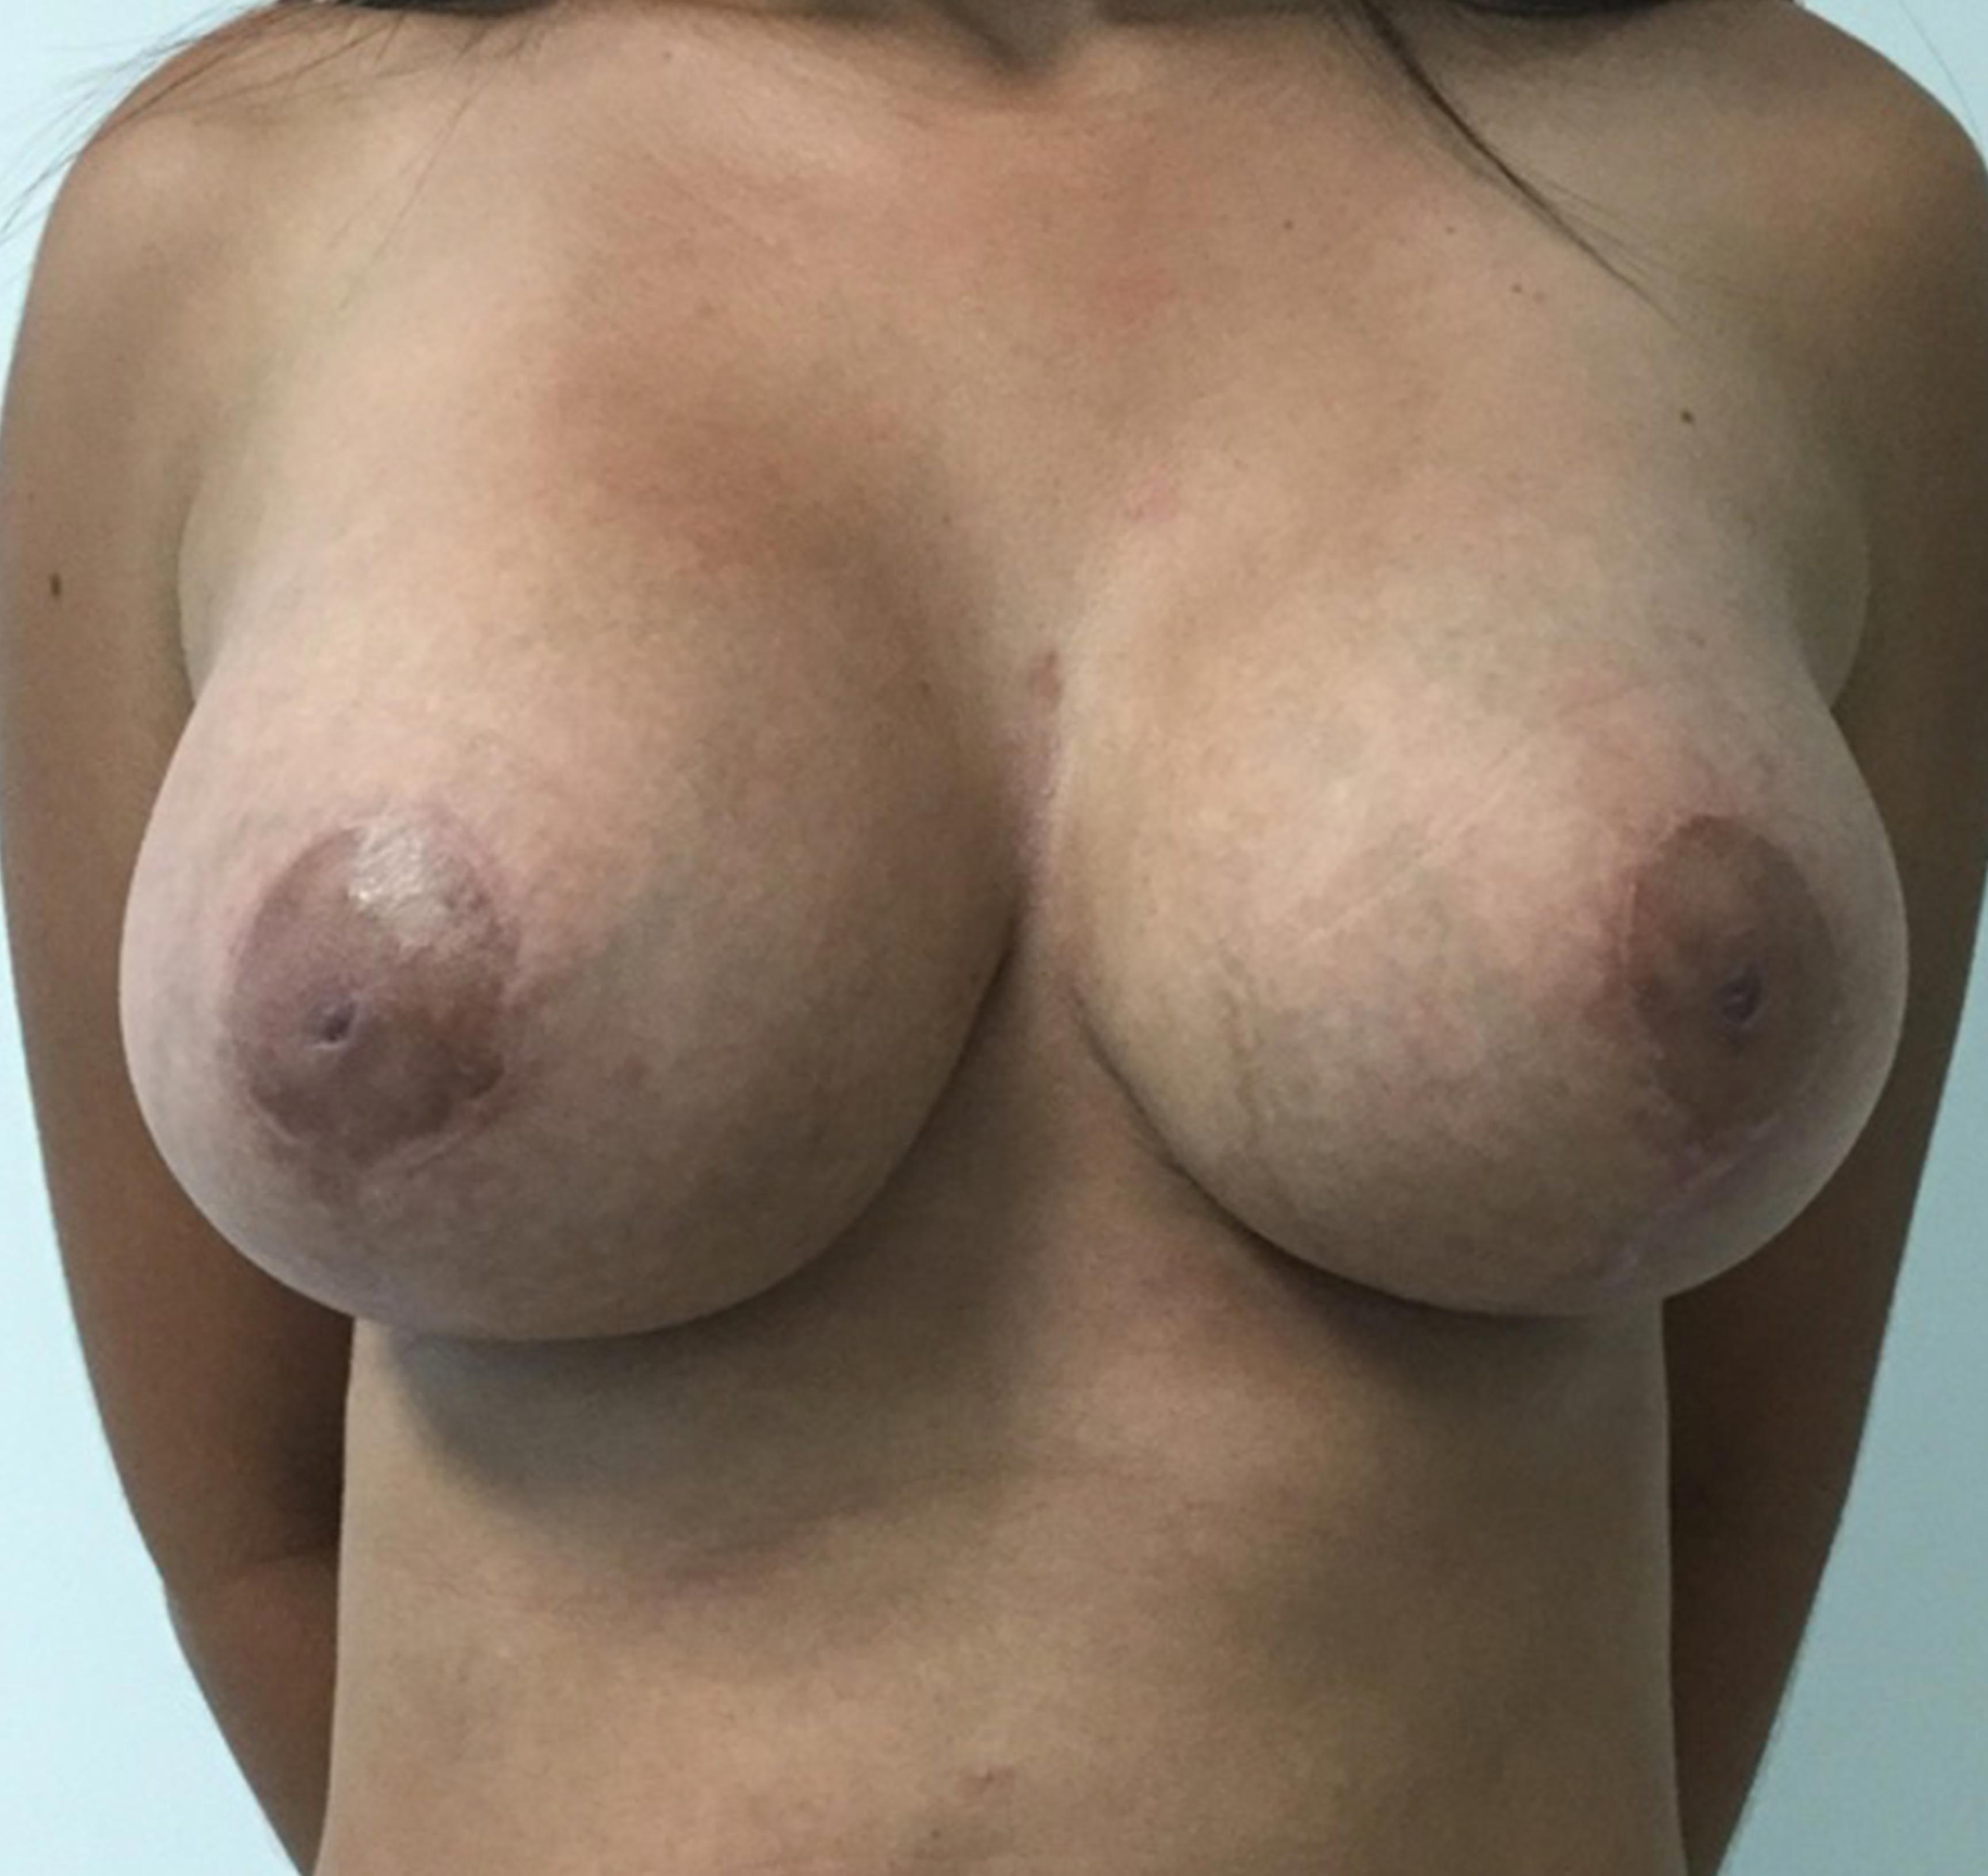 reduccion-con-implante2